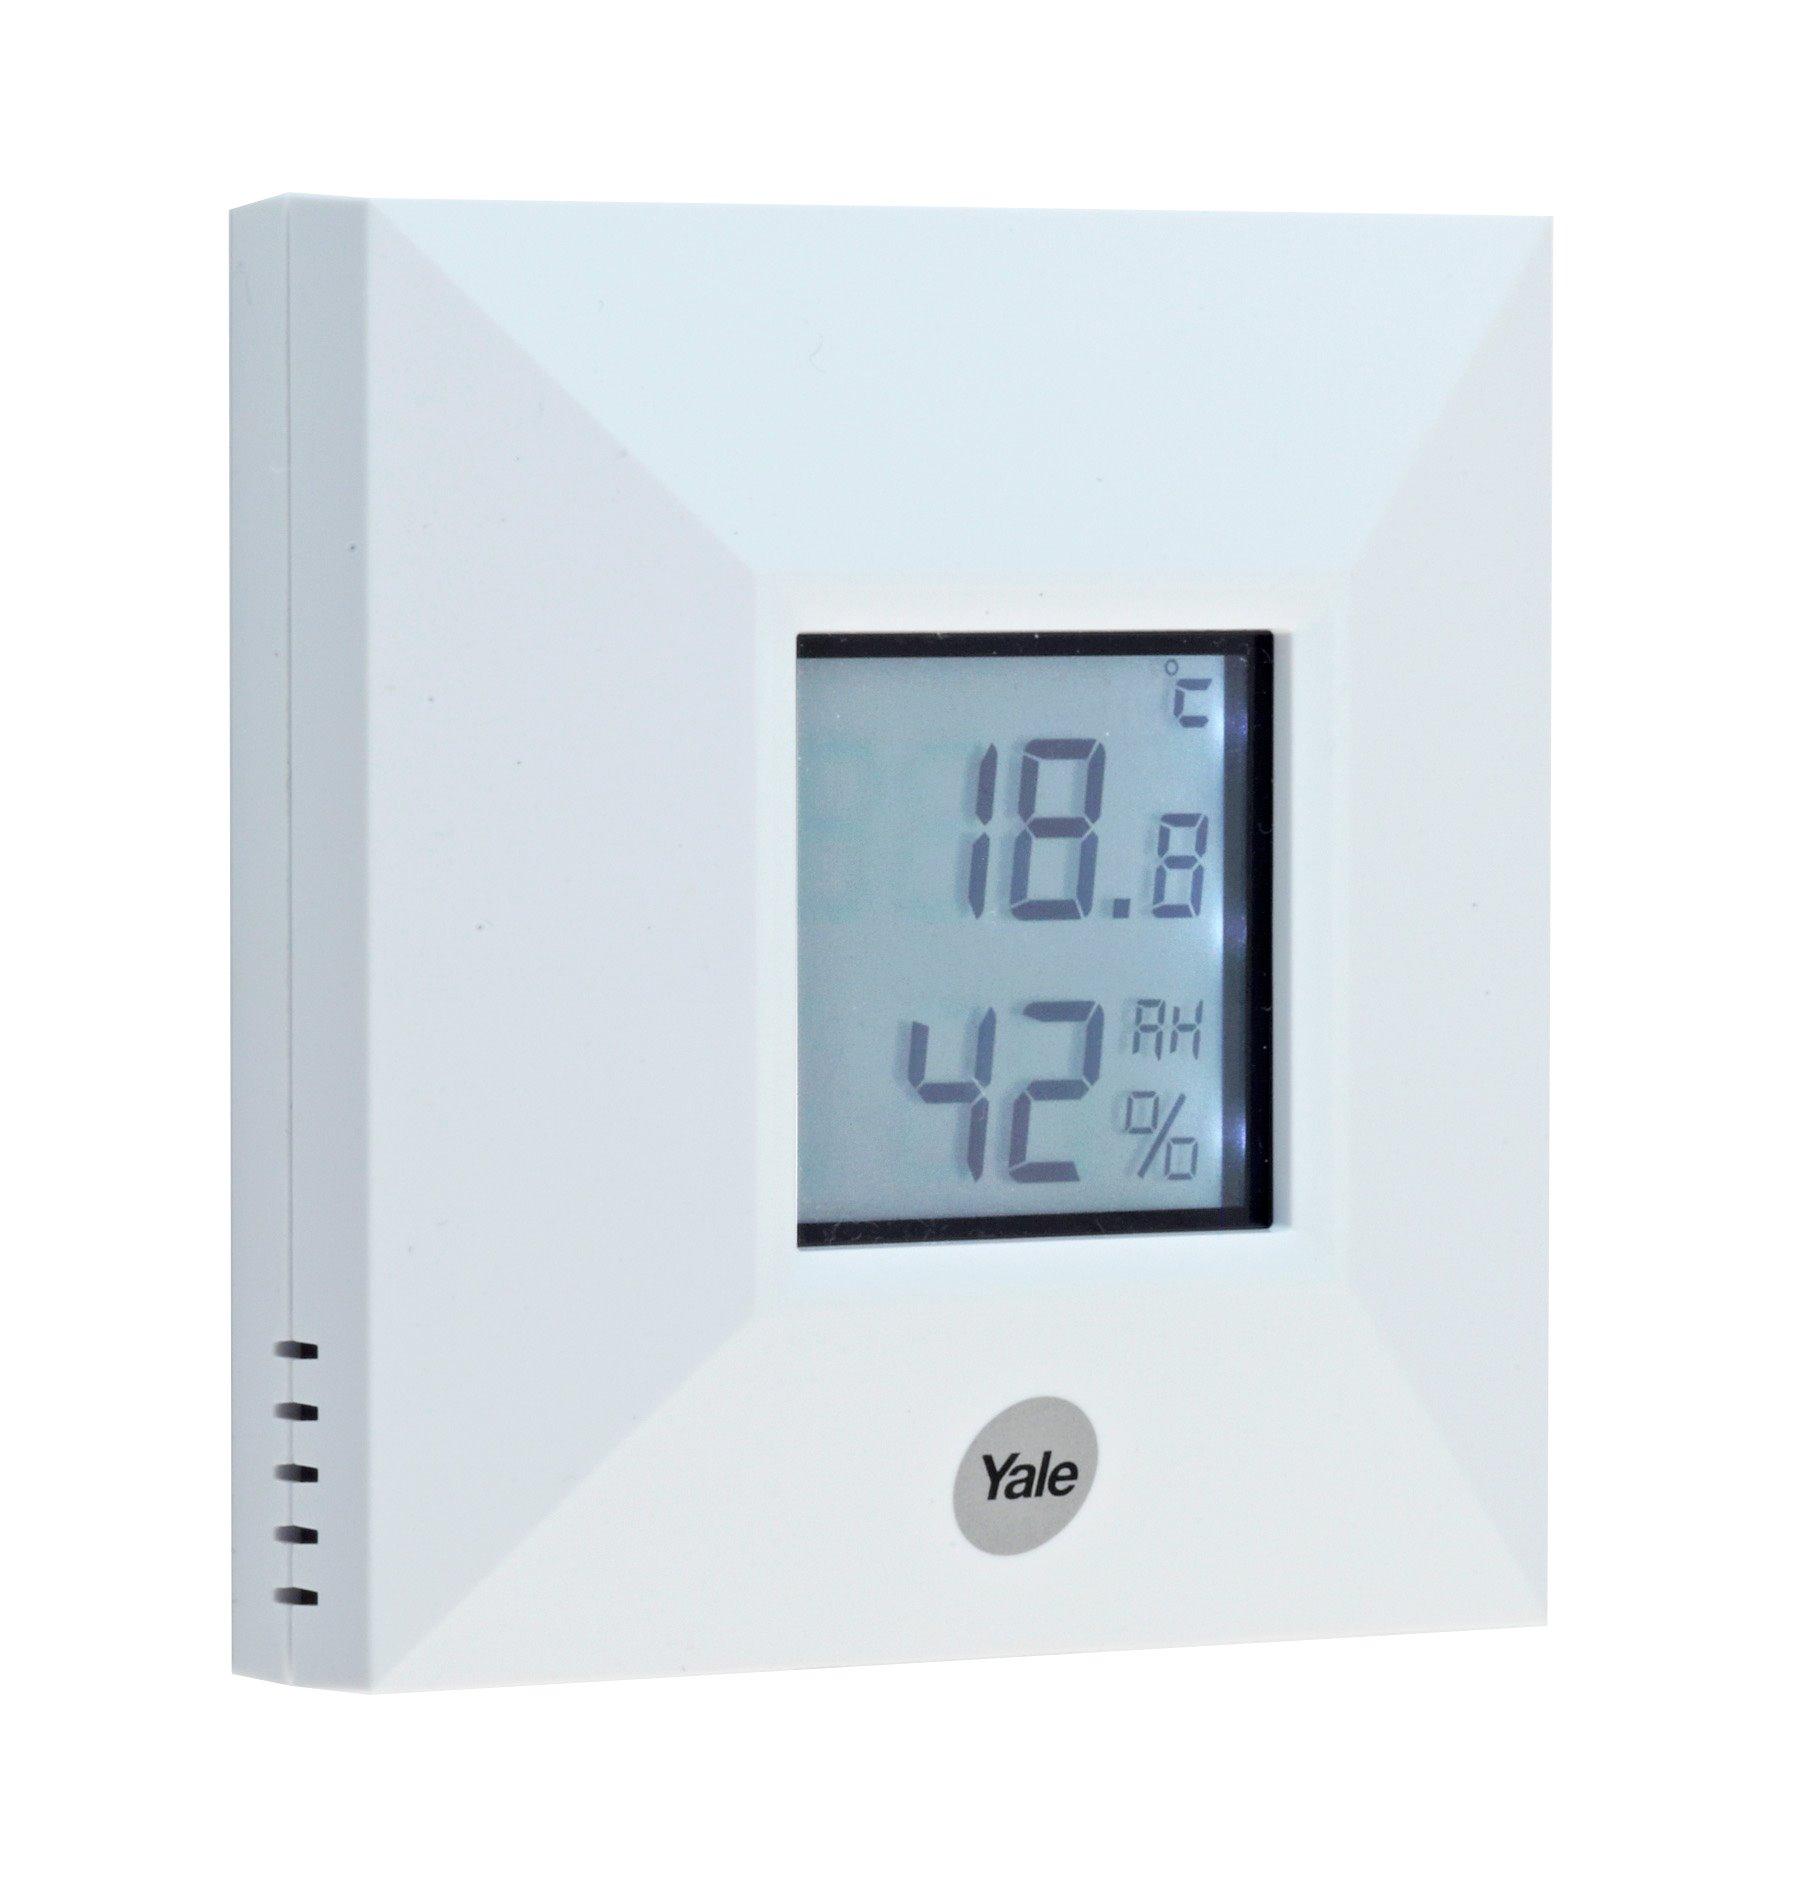 Yale Smart Living klimaatsensor SR-RS